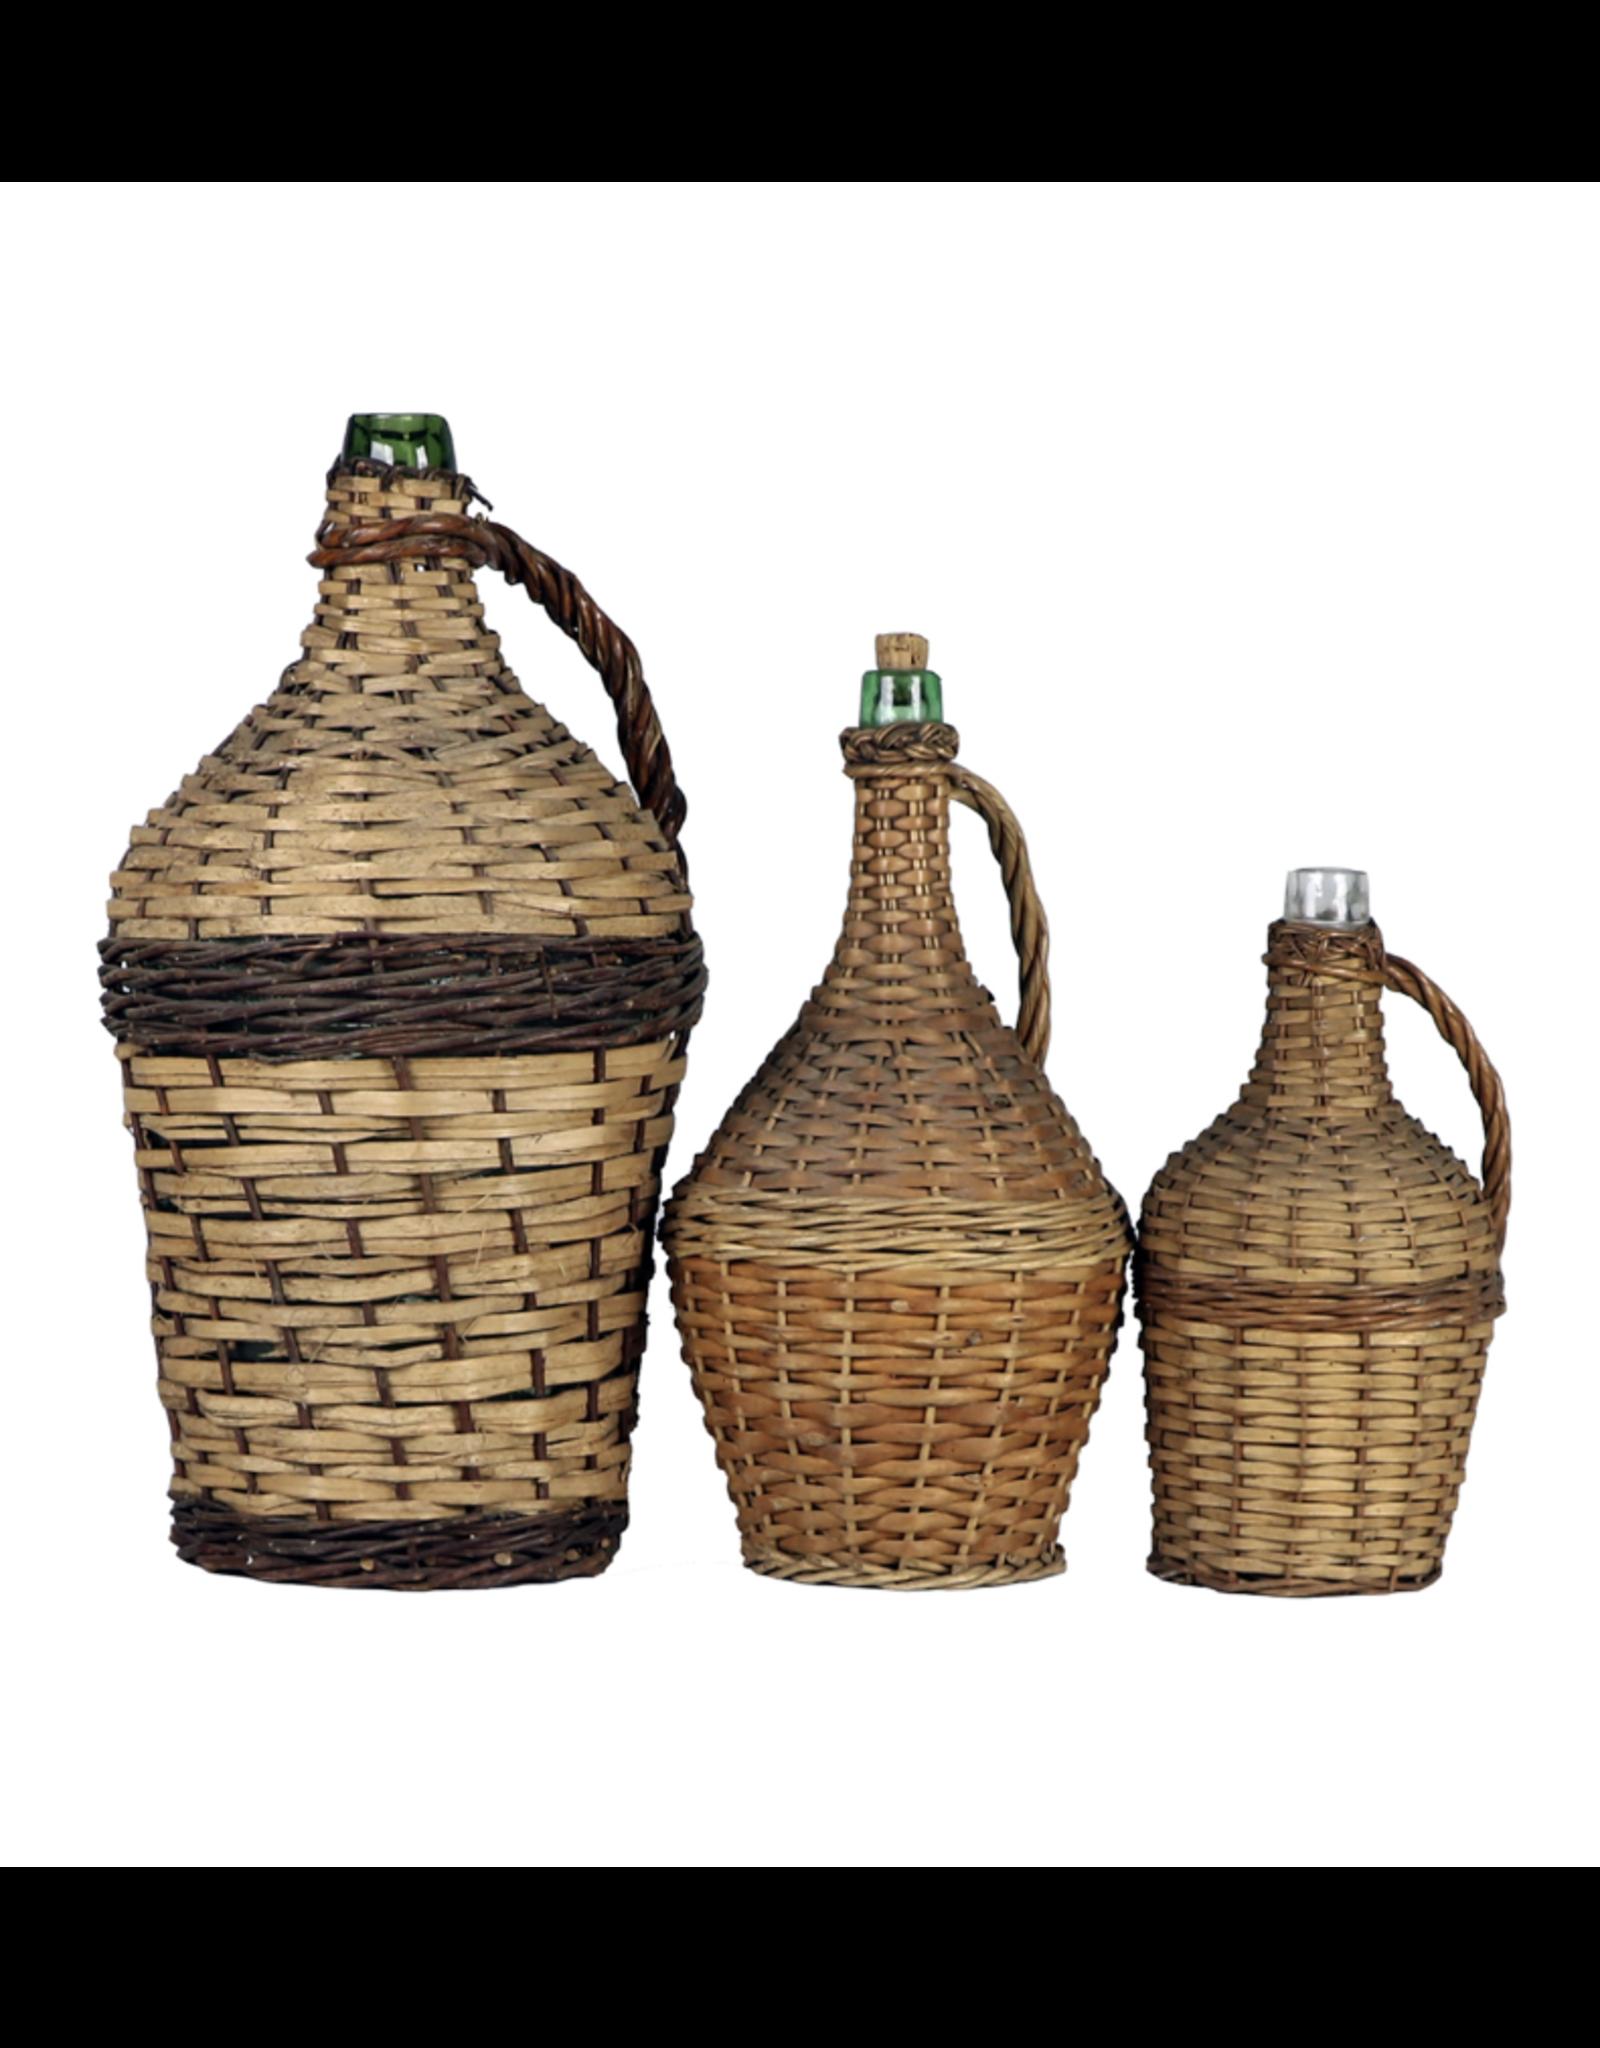 Wicker Covered Wine Bottle Medium